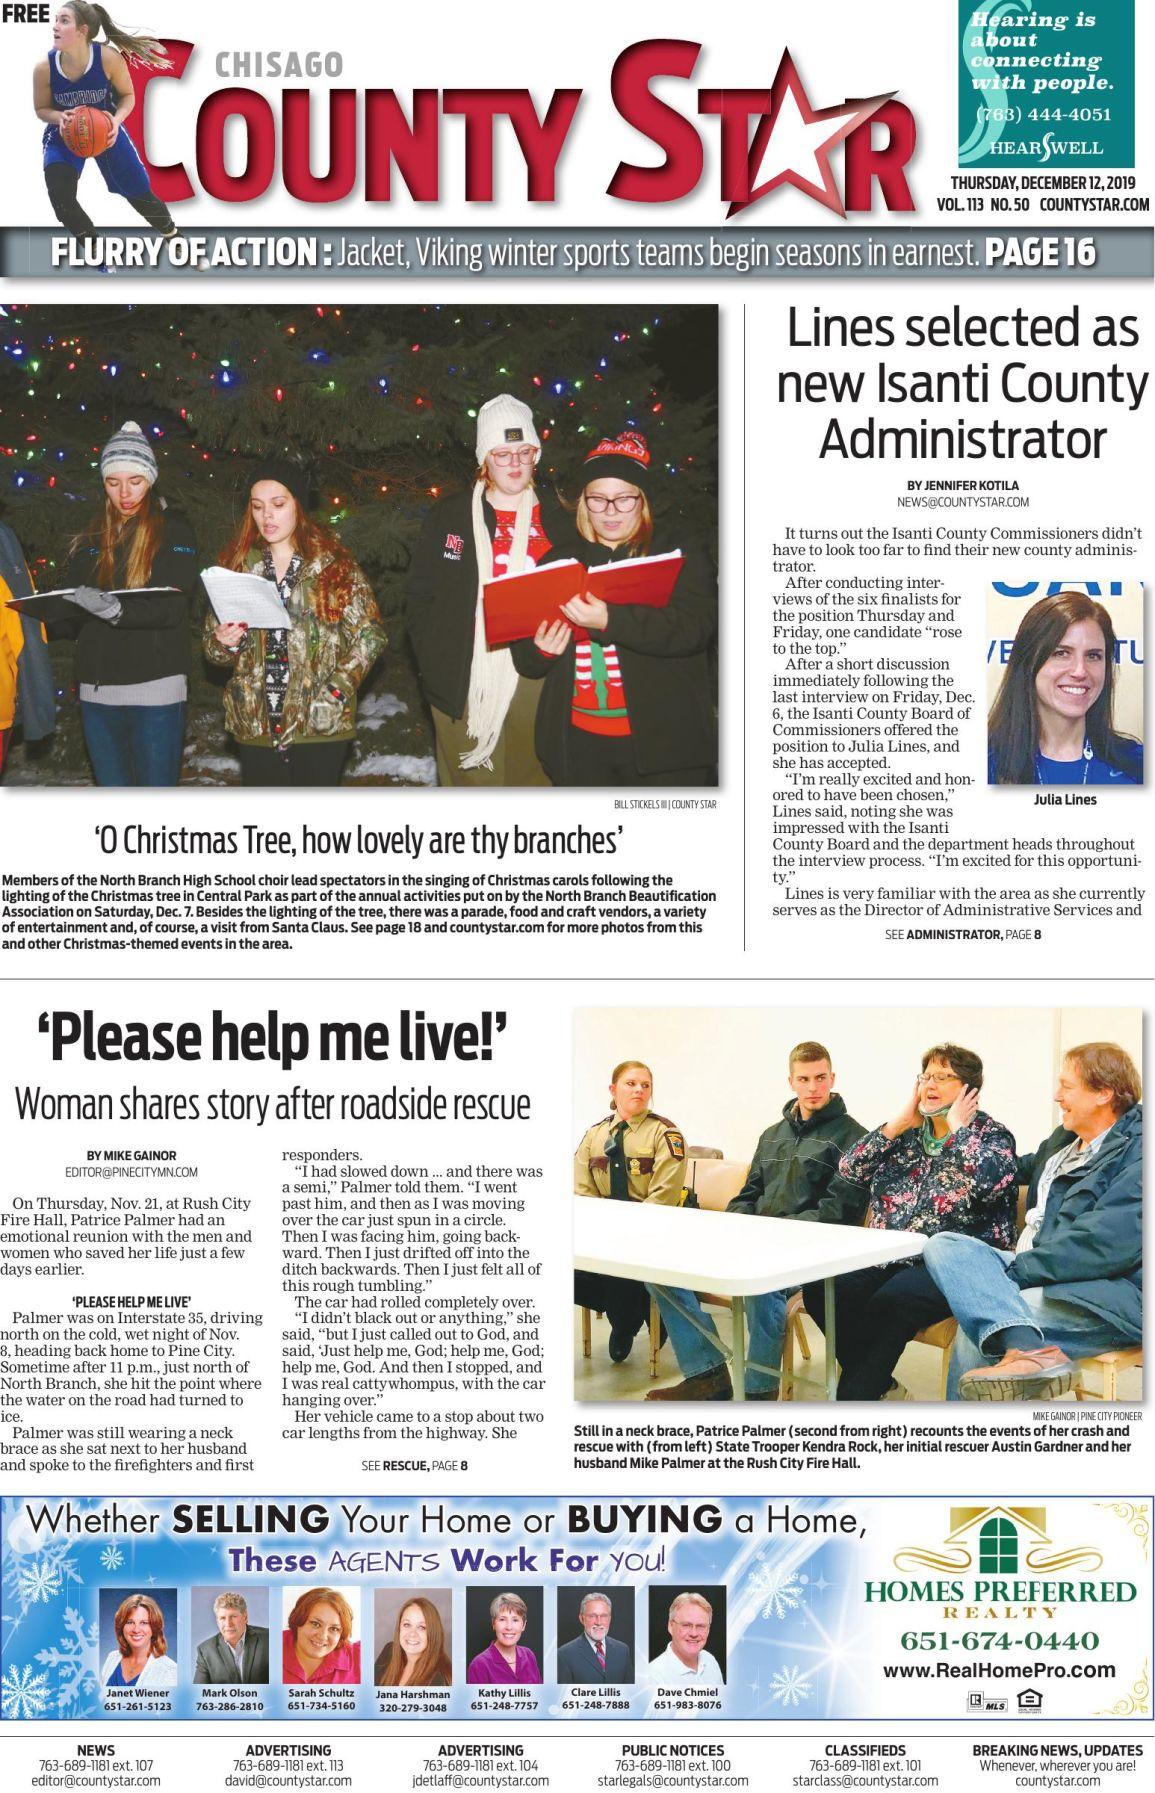 Chisago County Star December 12, 2019 e-edition